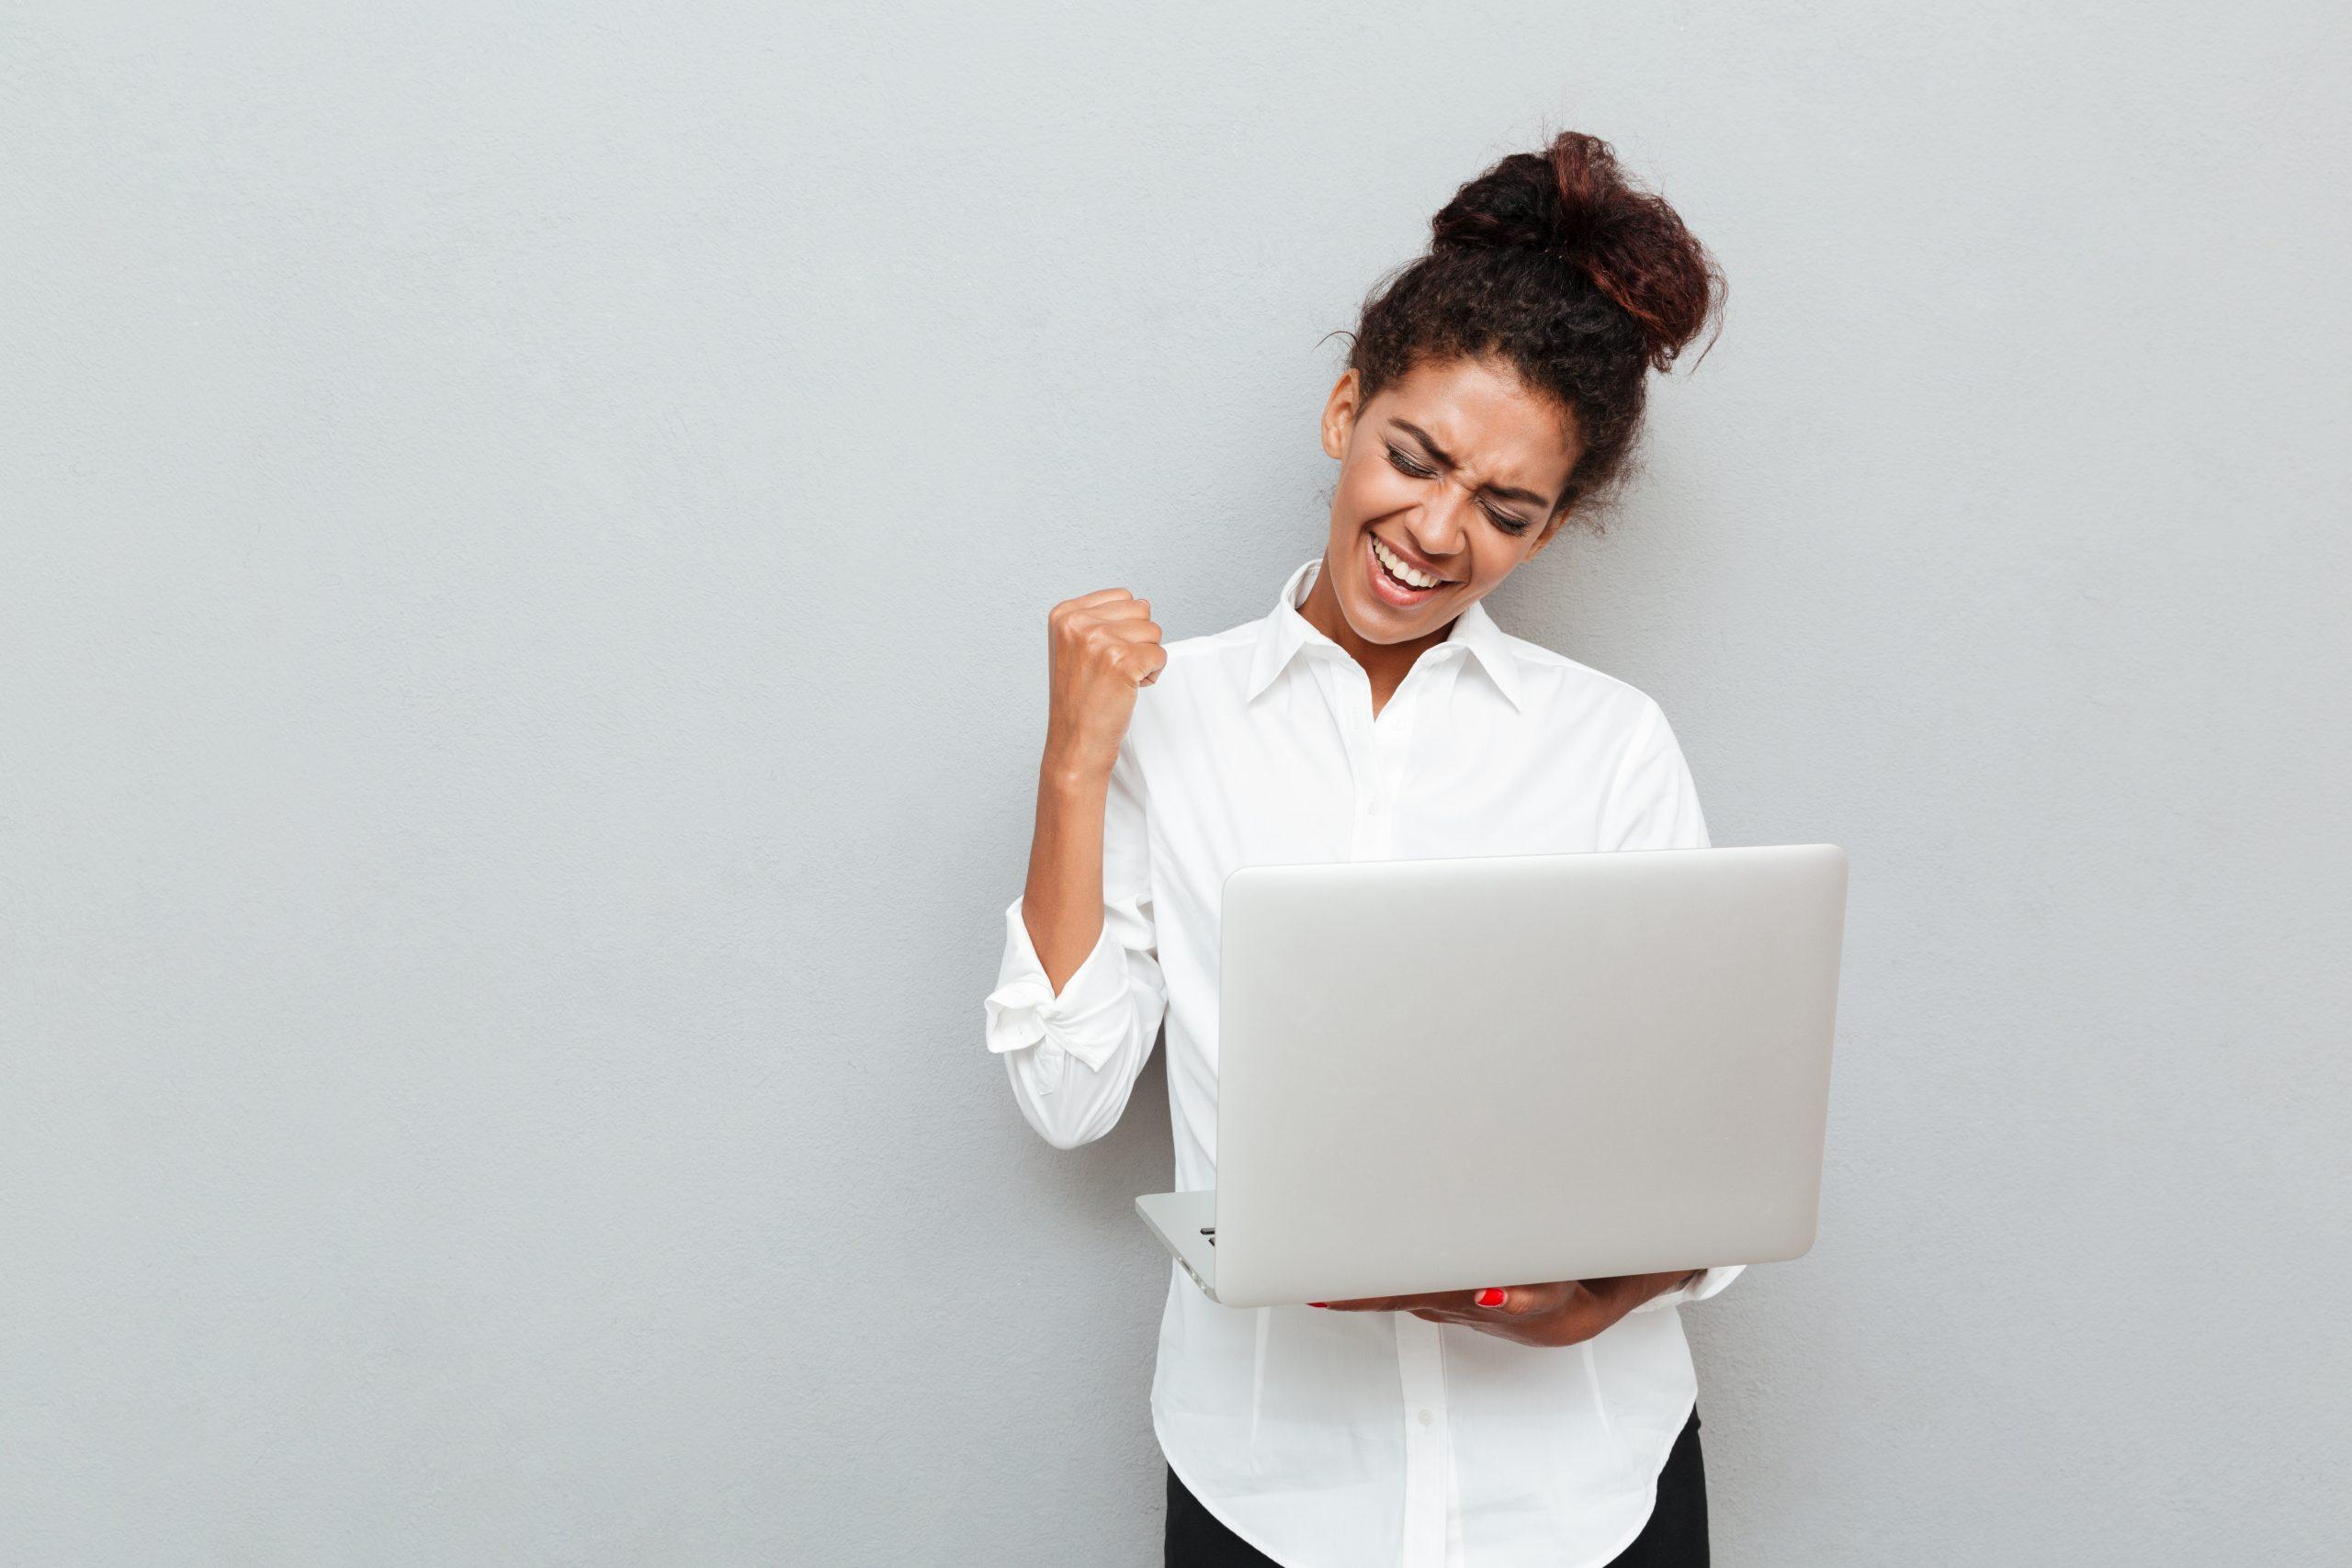 Cheerful business woman make winner gesture.